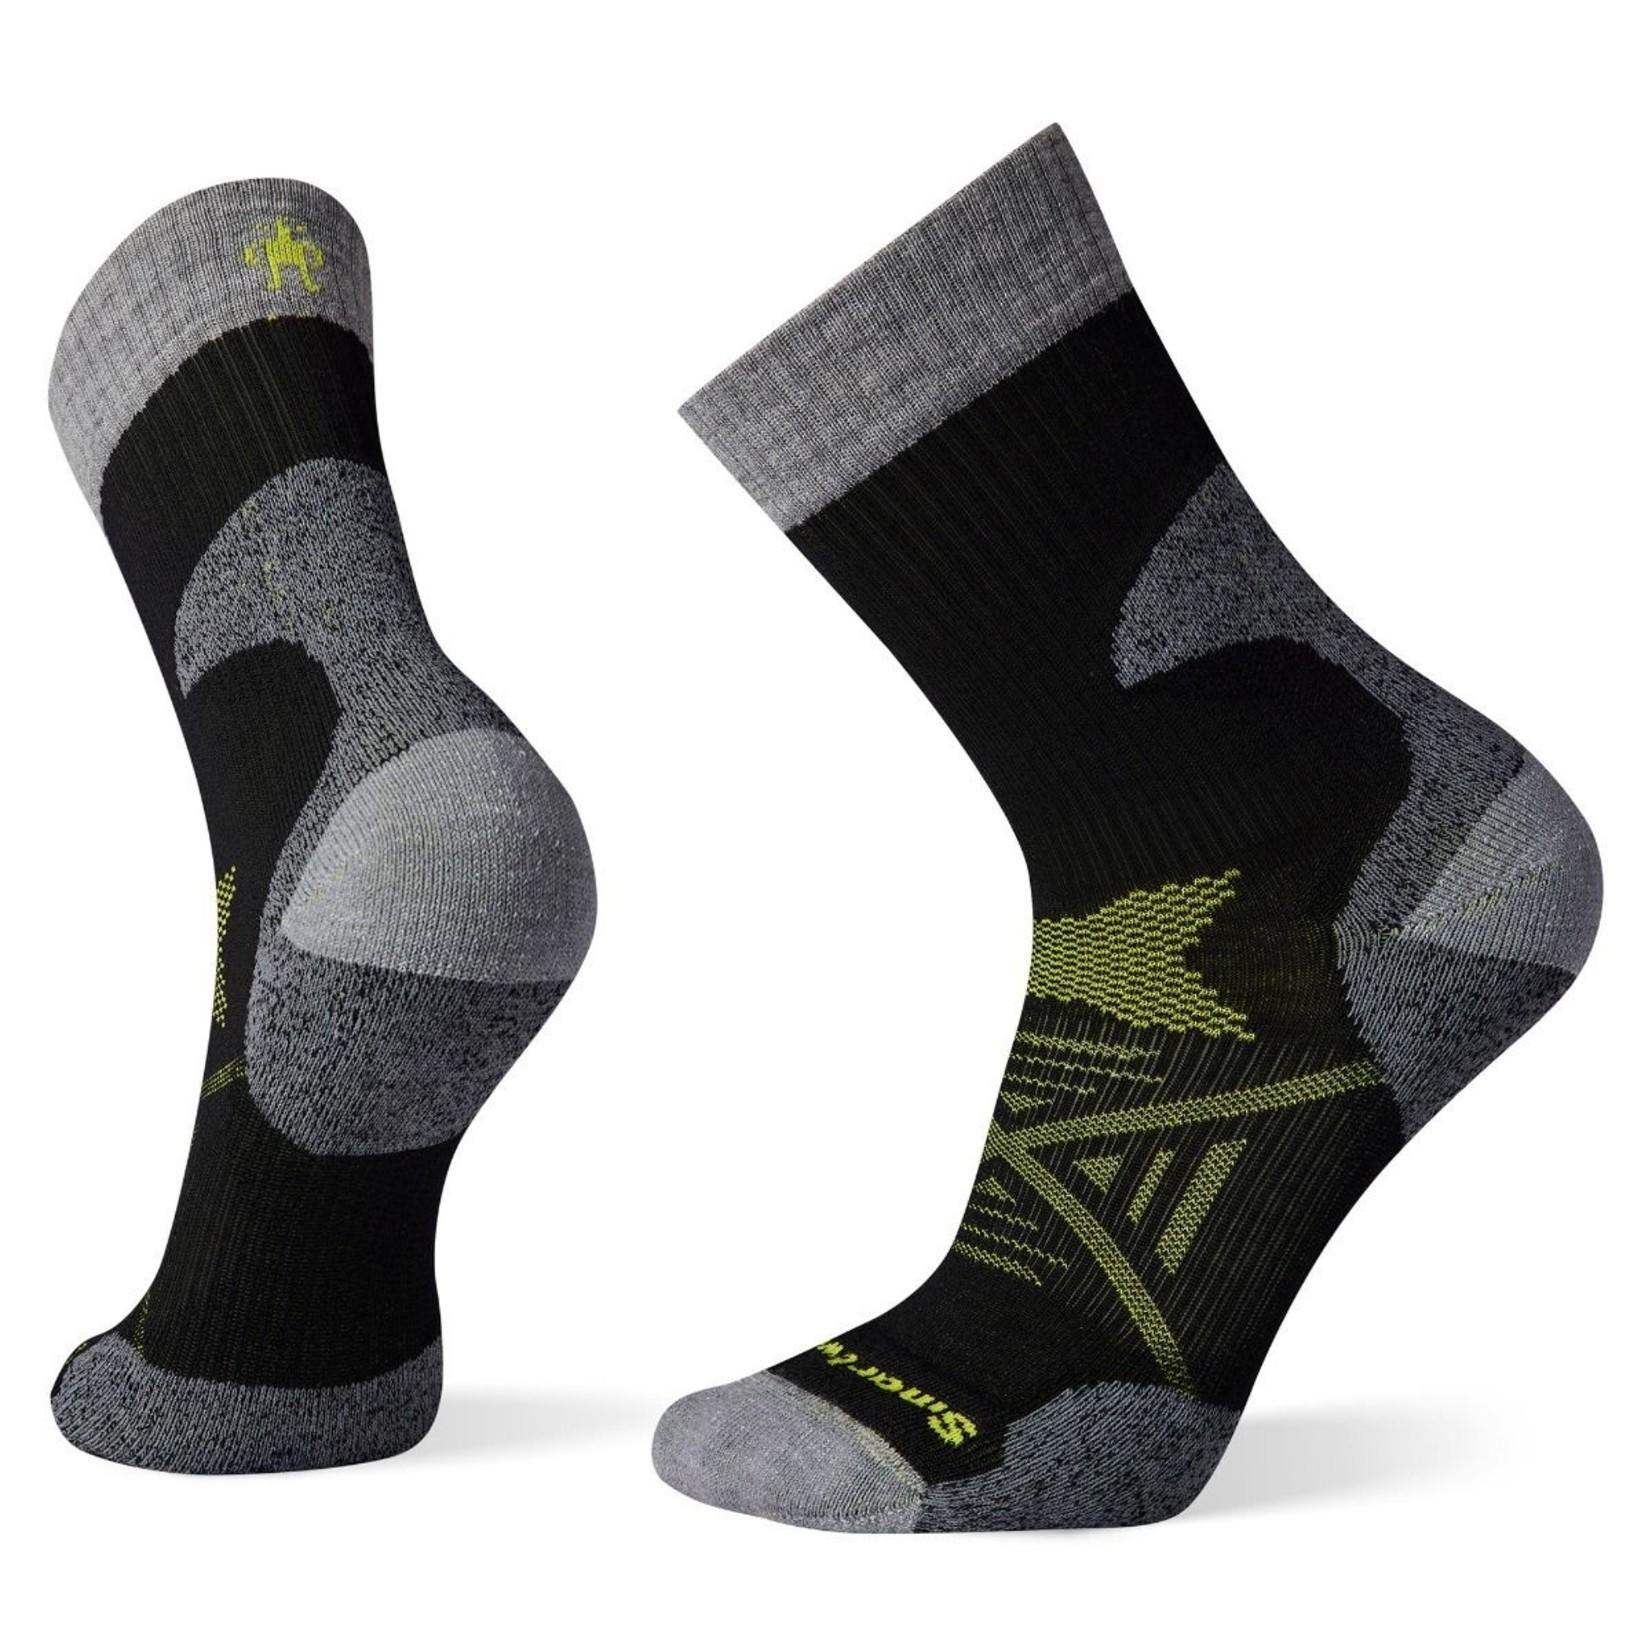 Smartwool PhD® Pro Outdoor Light Crew Socks